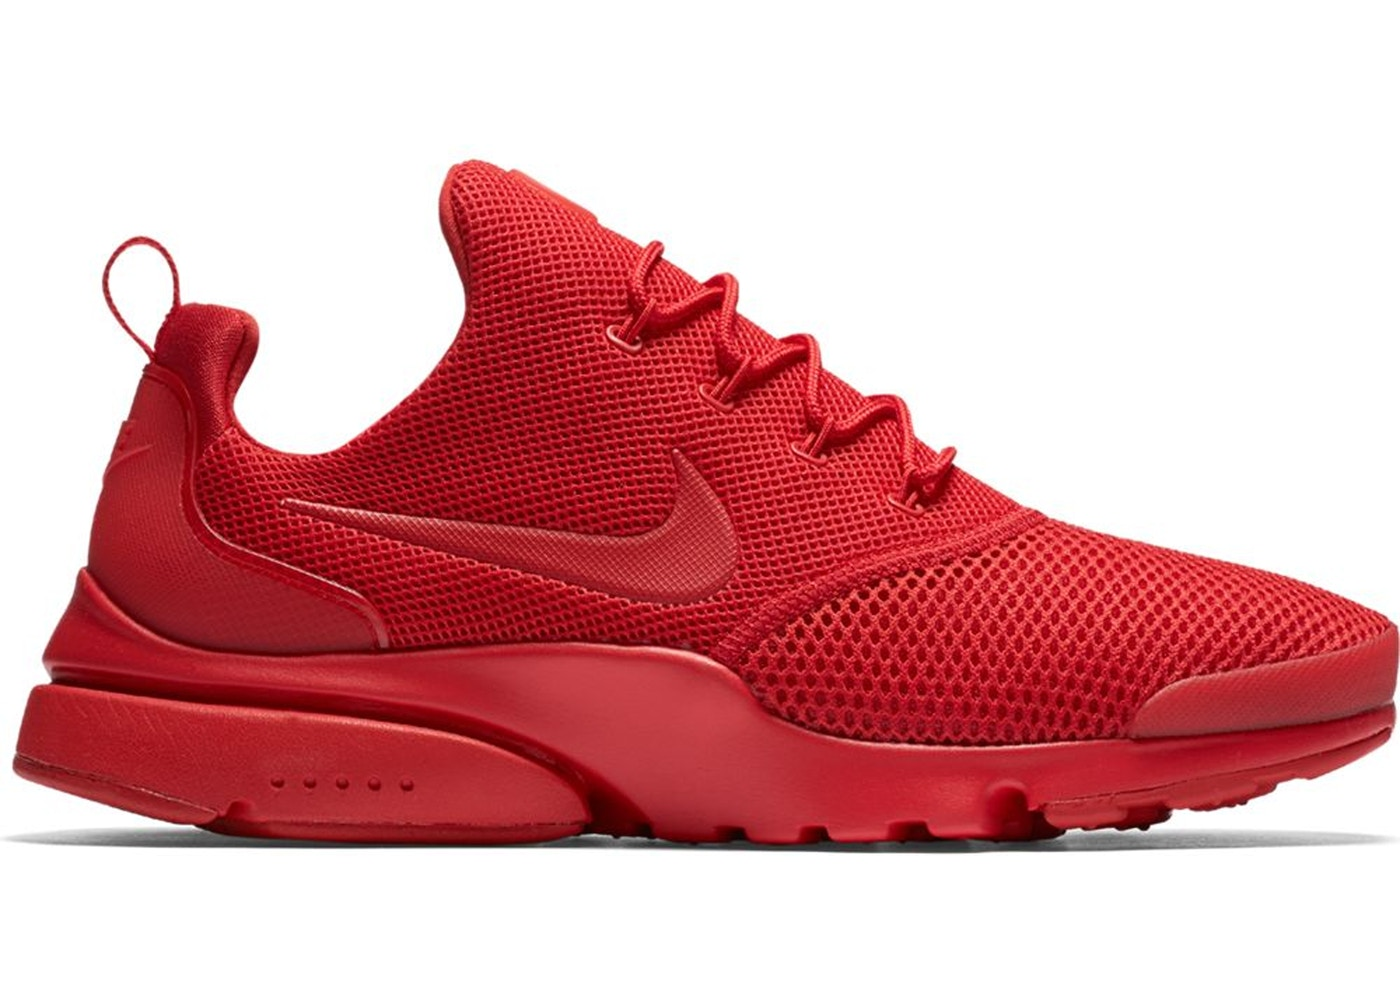 Nike Presto Fly Triple Red - 908019-601